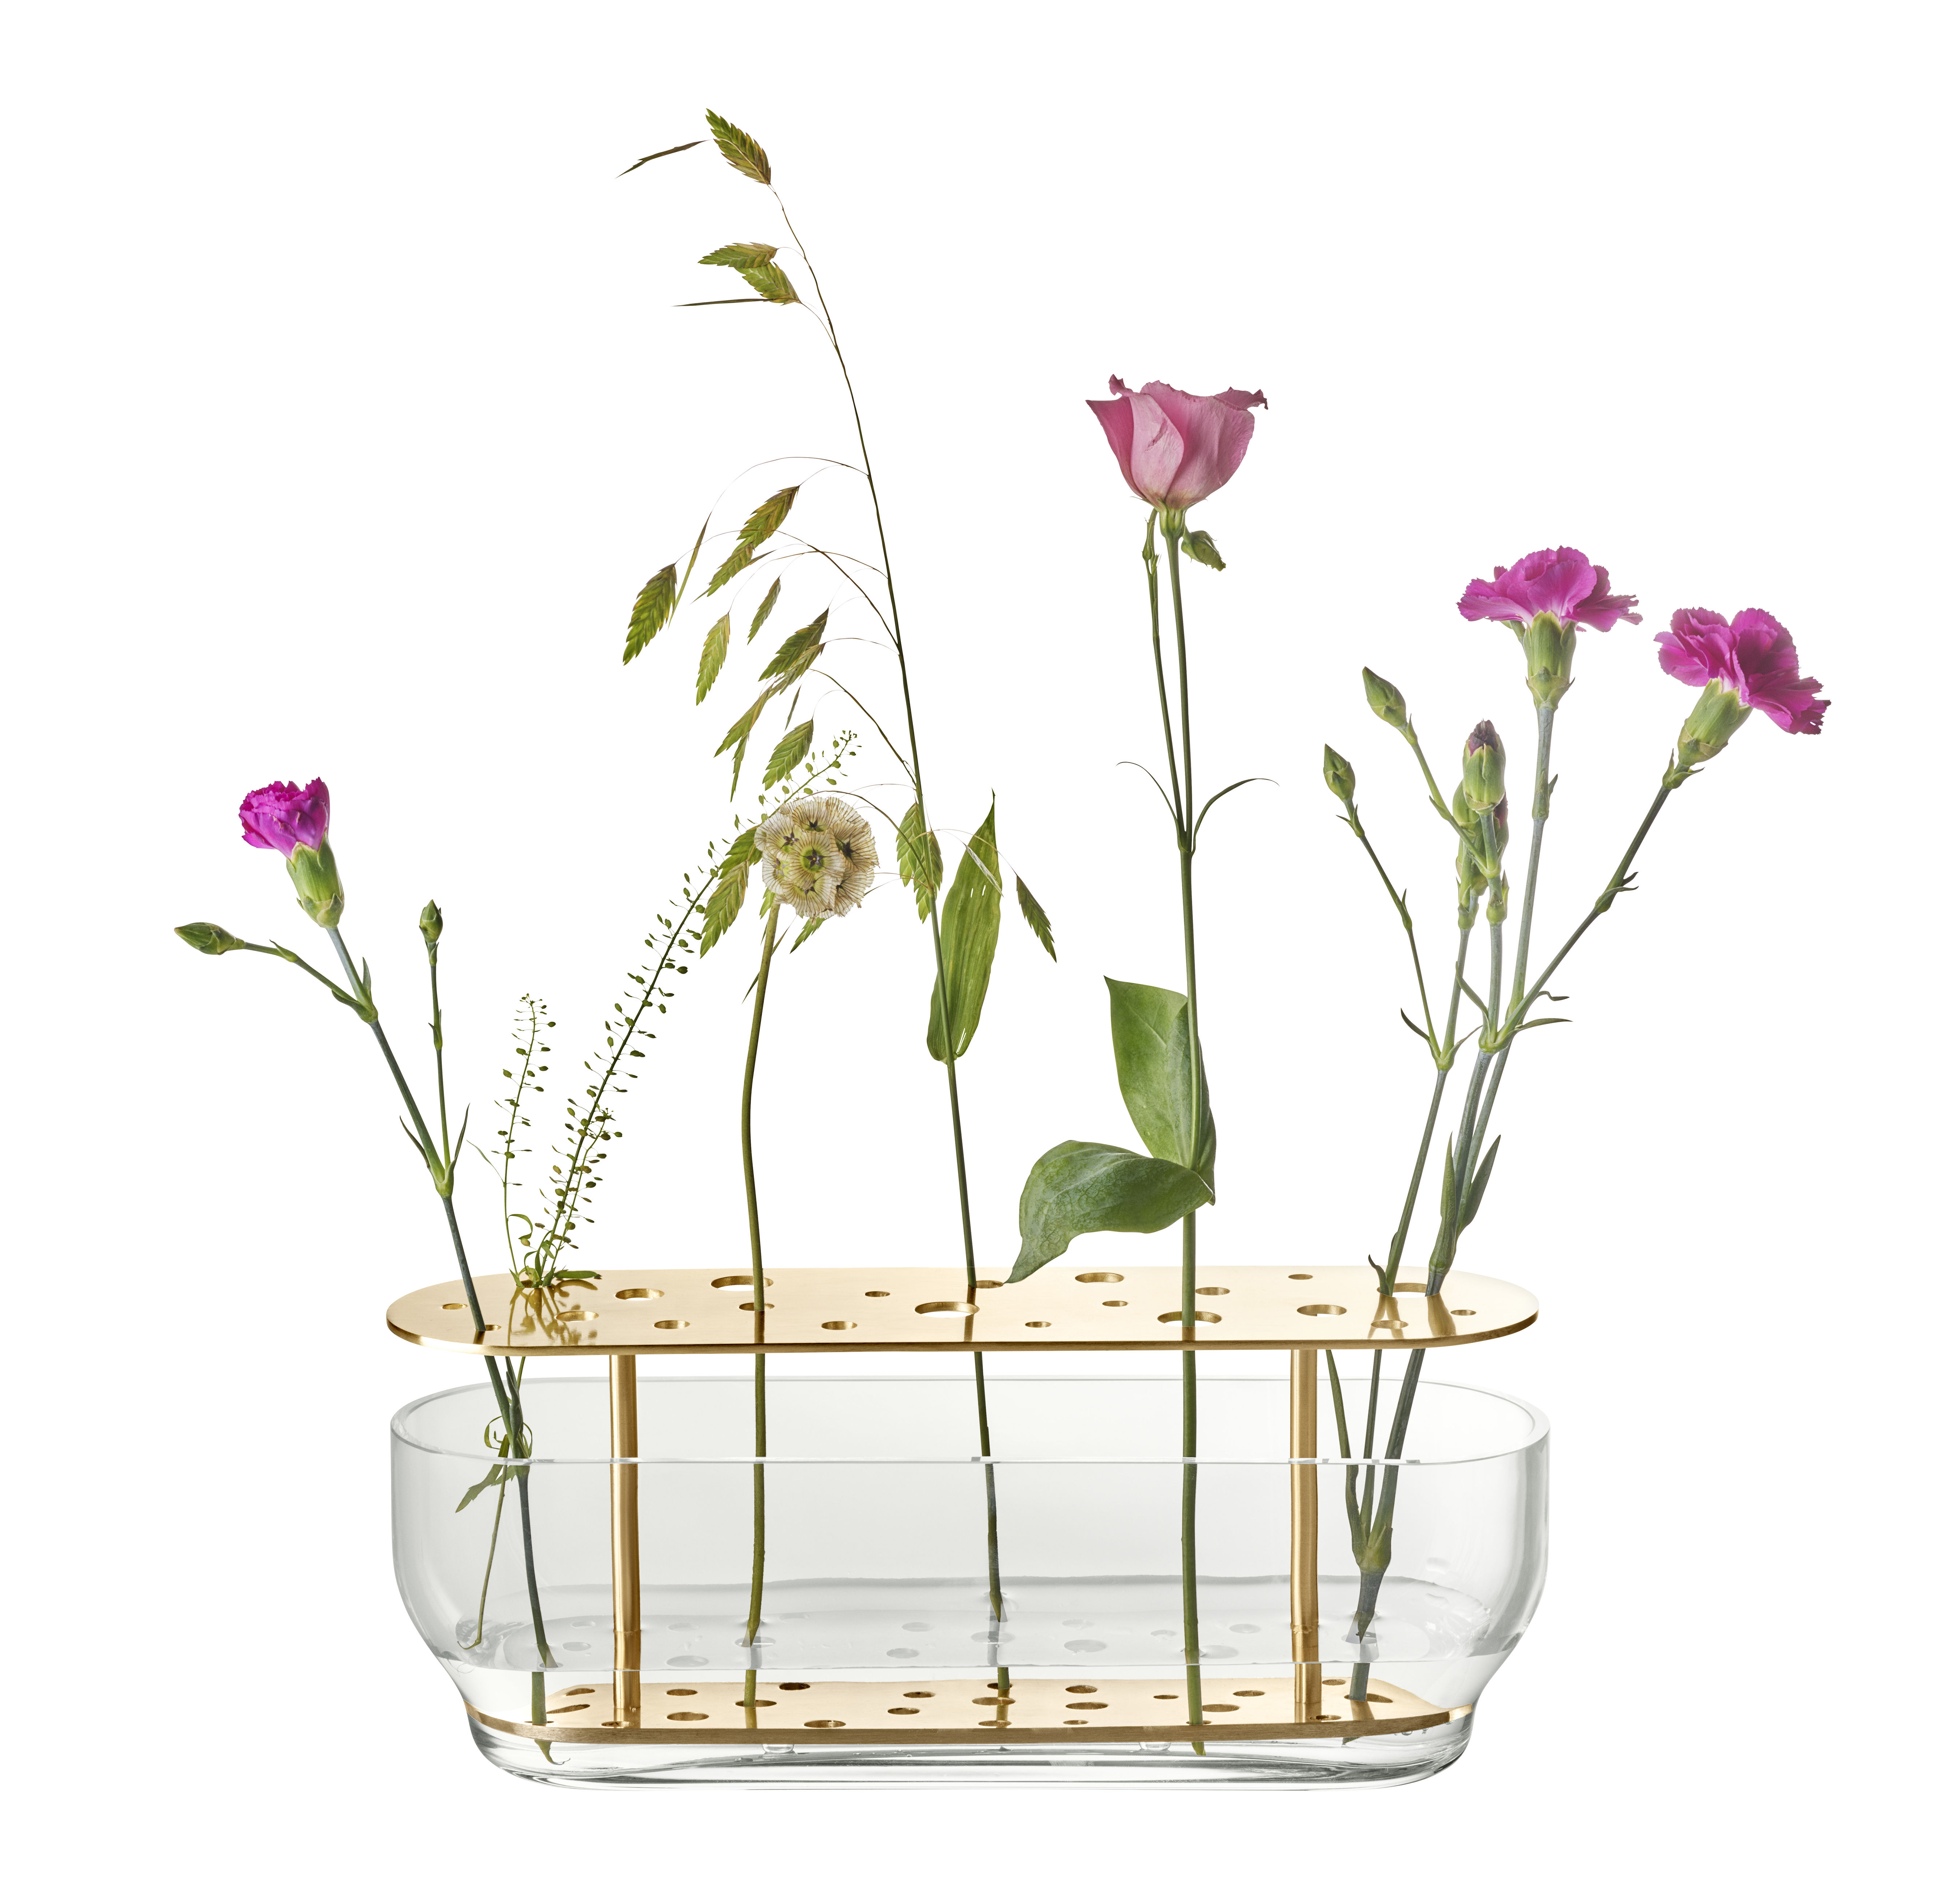 Dekoration - Vasen - Ikebana Long Vase / Messing & Glas - H 10 cm - Fritz Hansen - Long / Messing - Messing, mundgeblasenes Glas